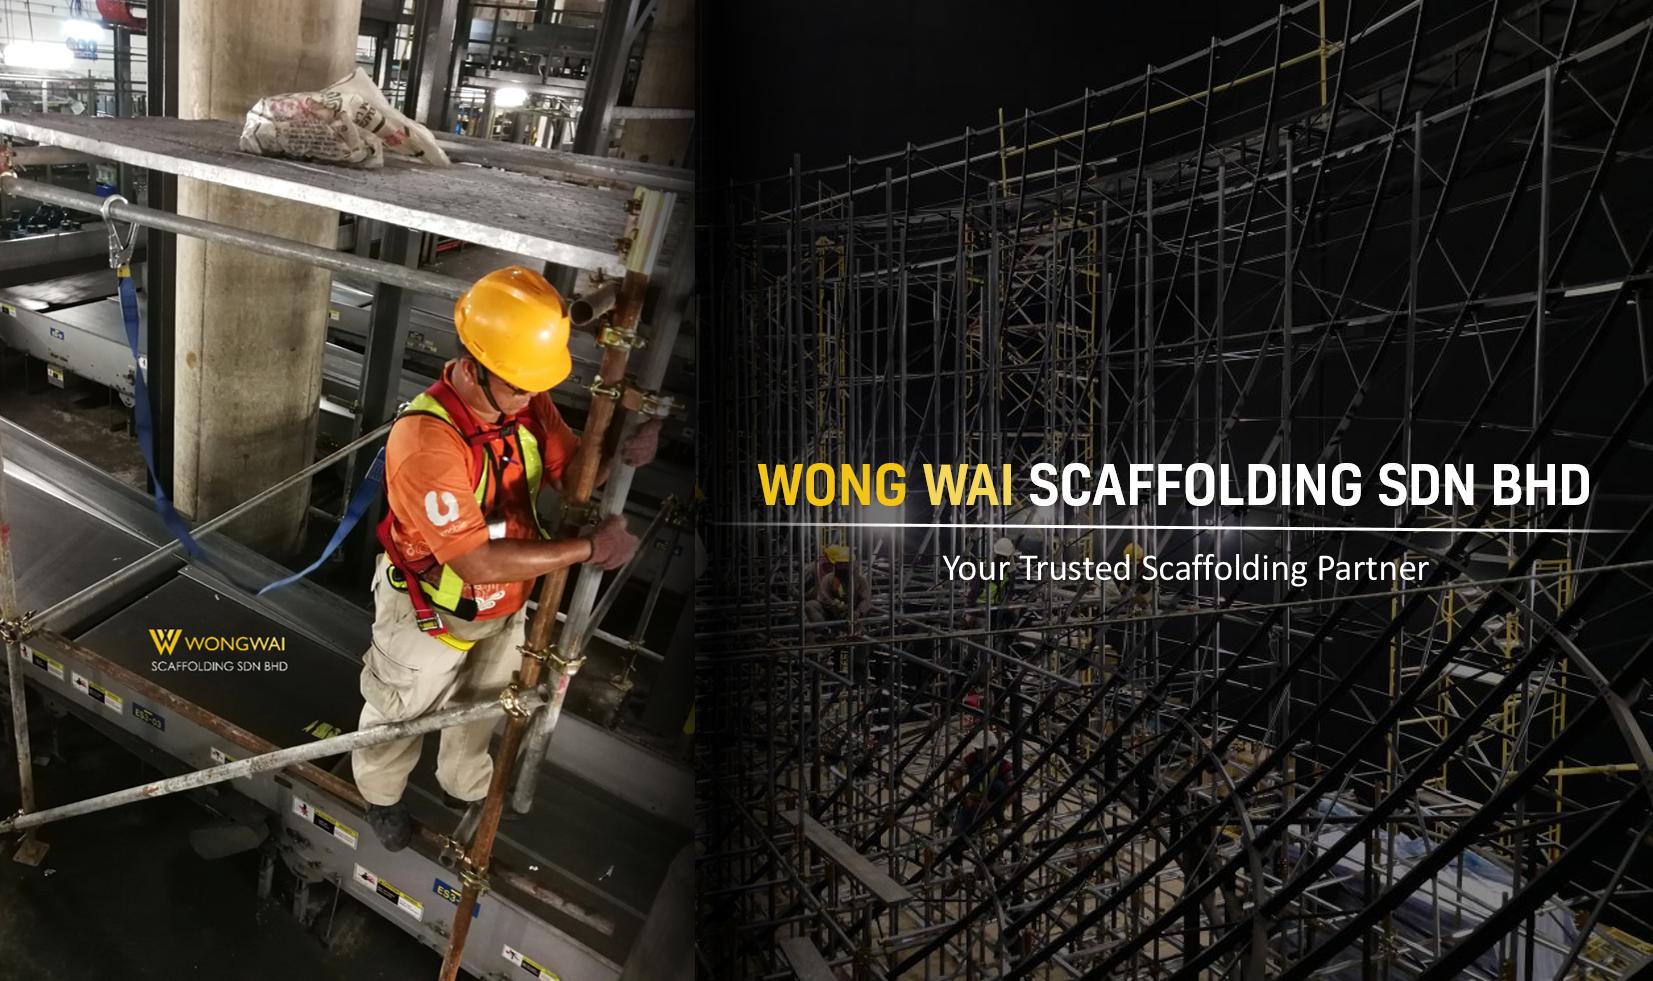 WONG WAI SCAFFOLDING SDN BHD - Malaysia